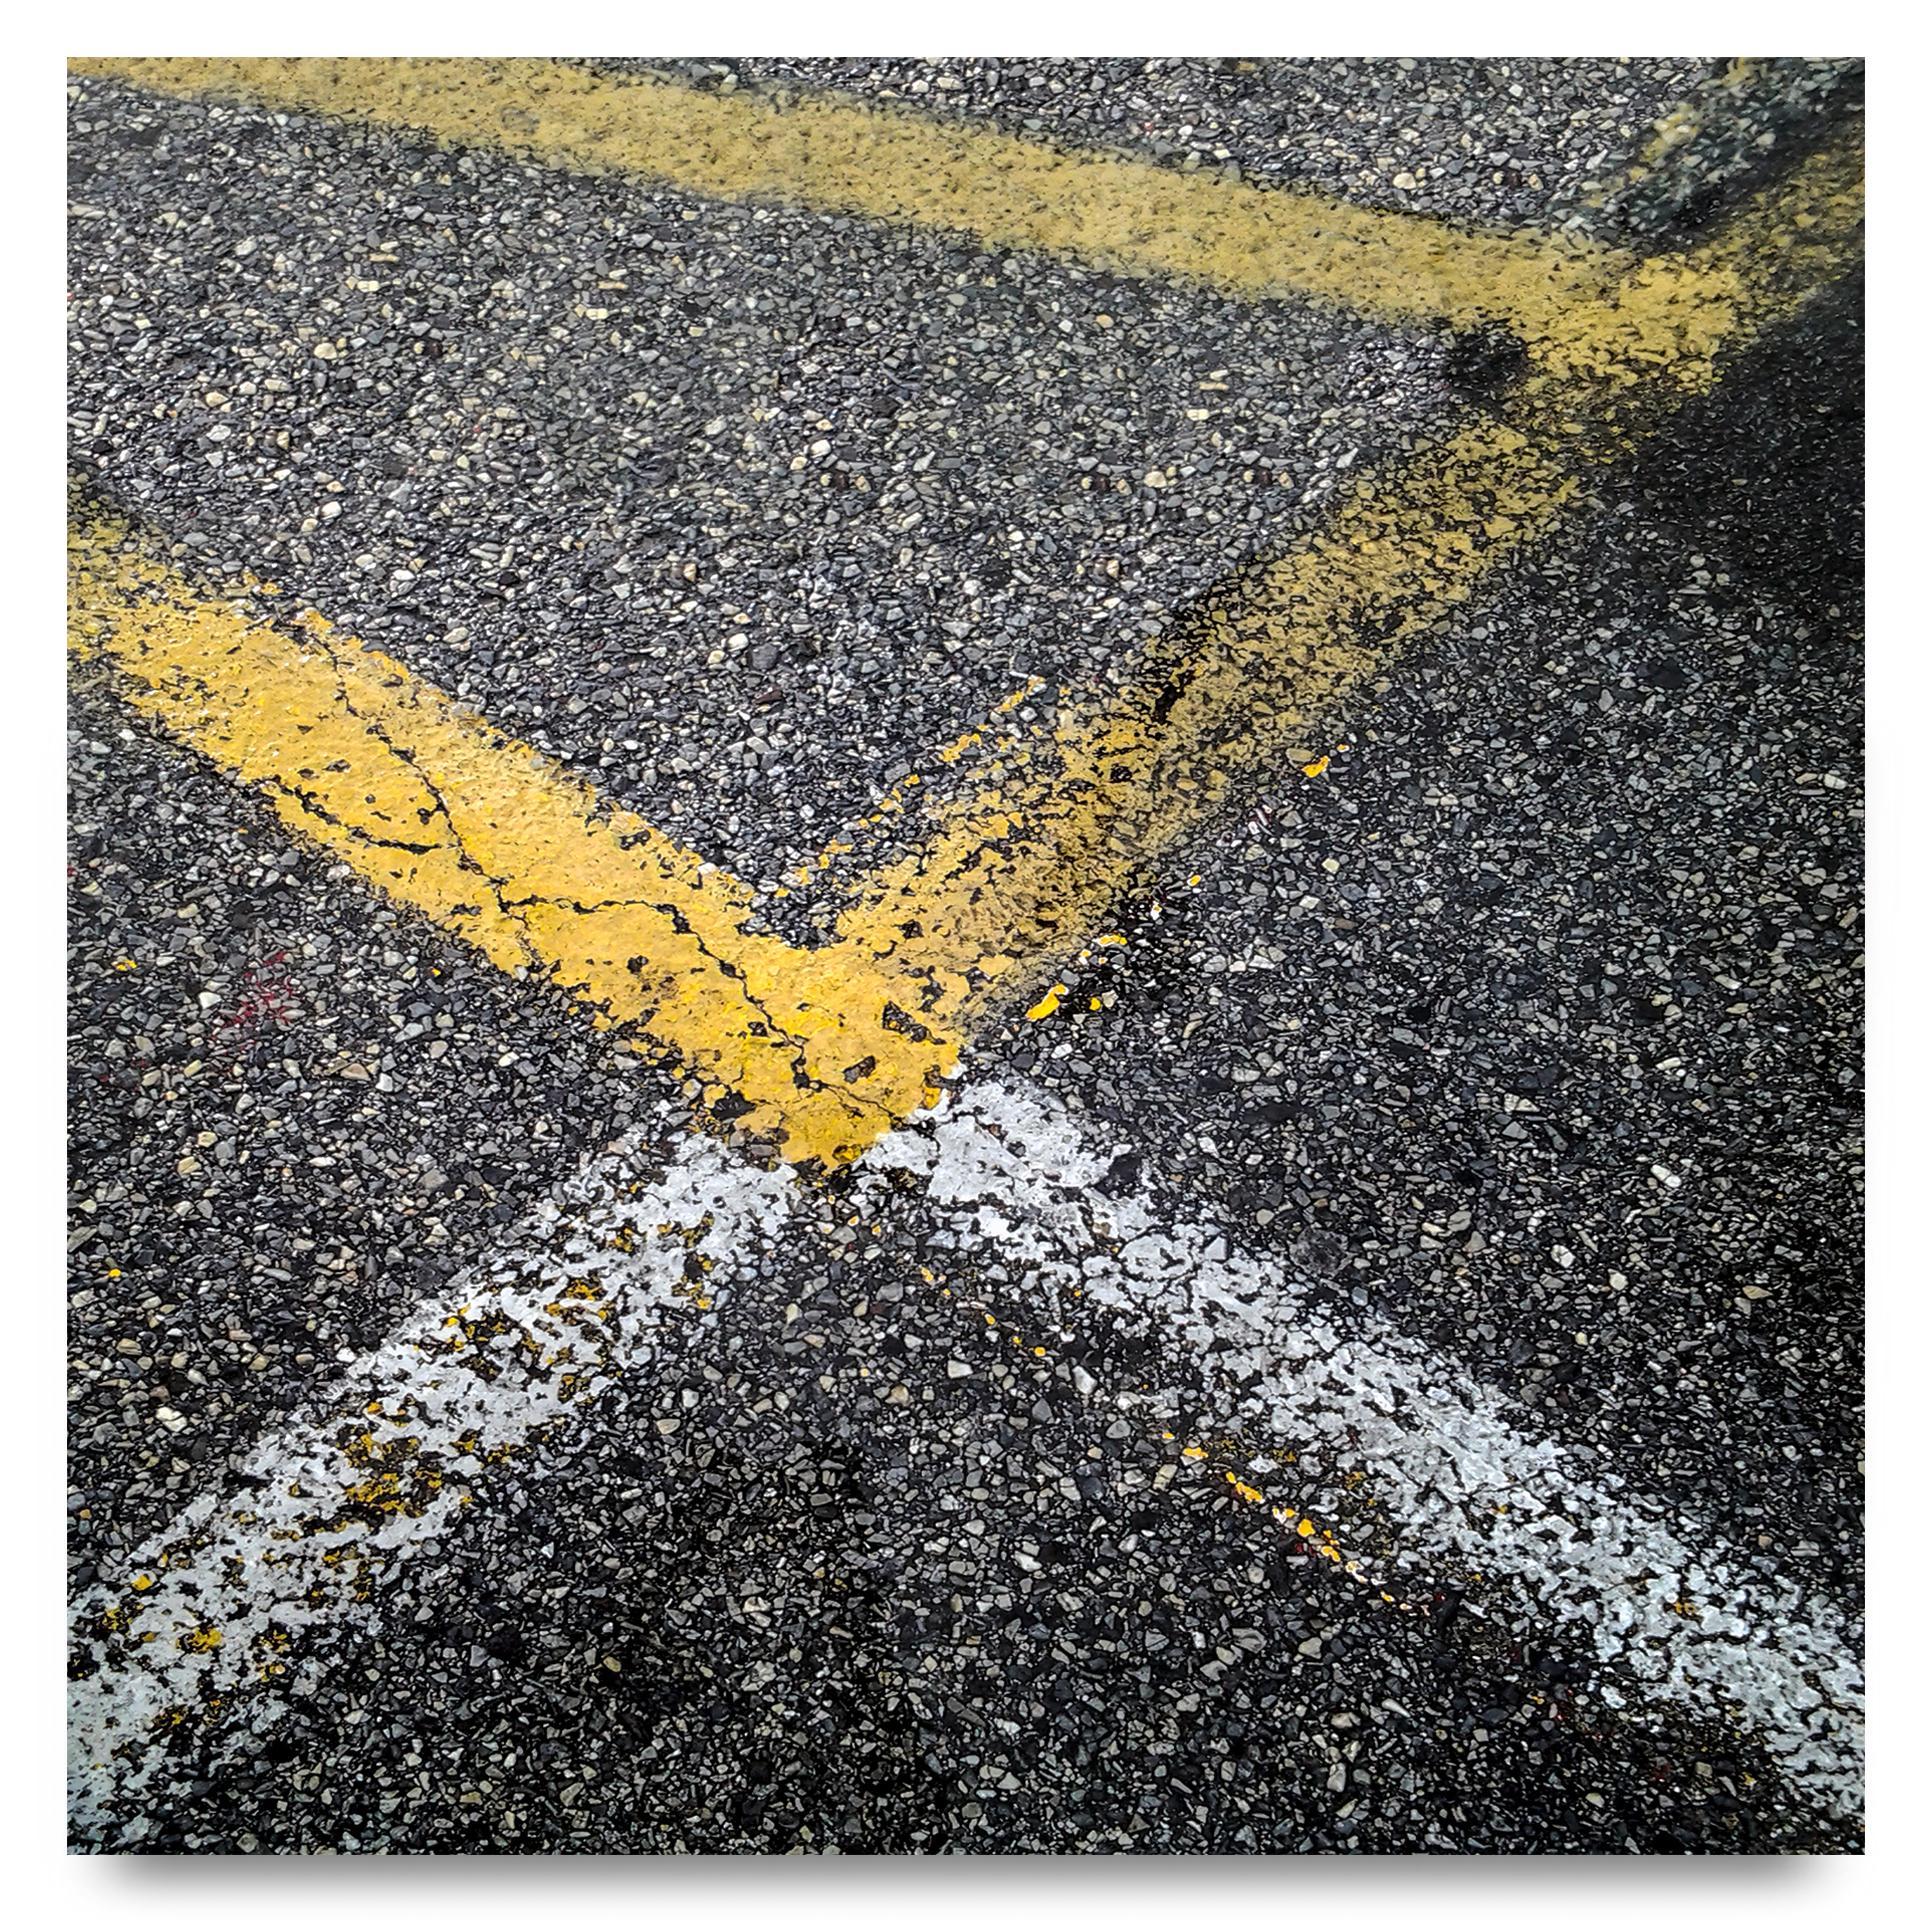 Road Rage#31, 2013